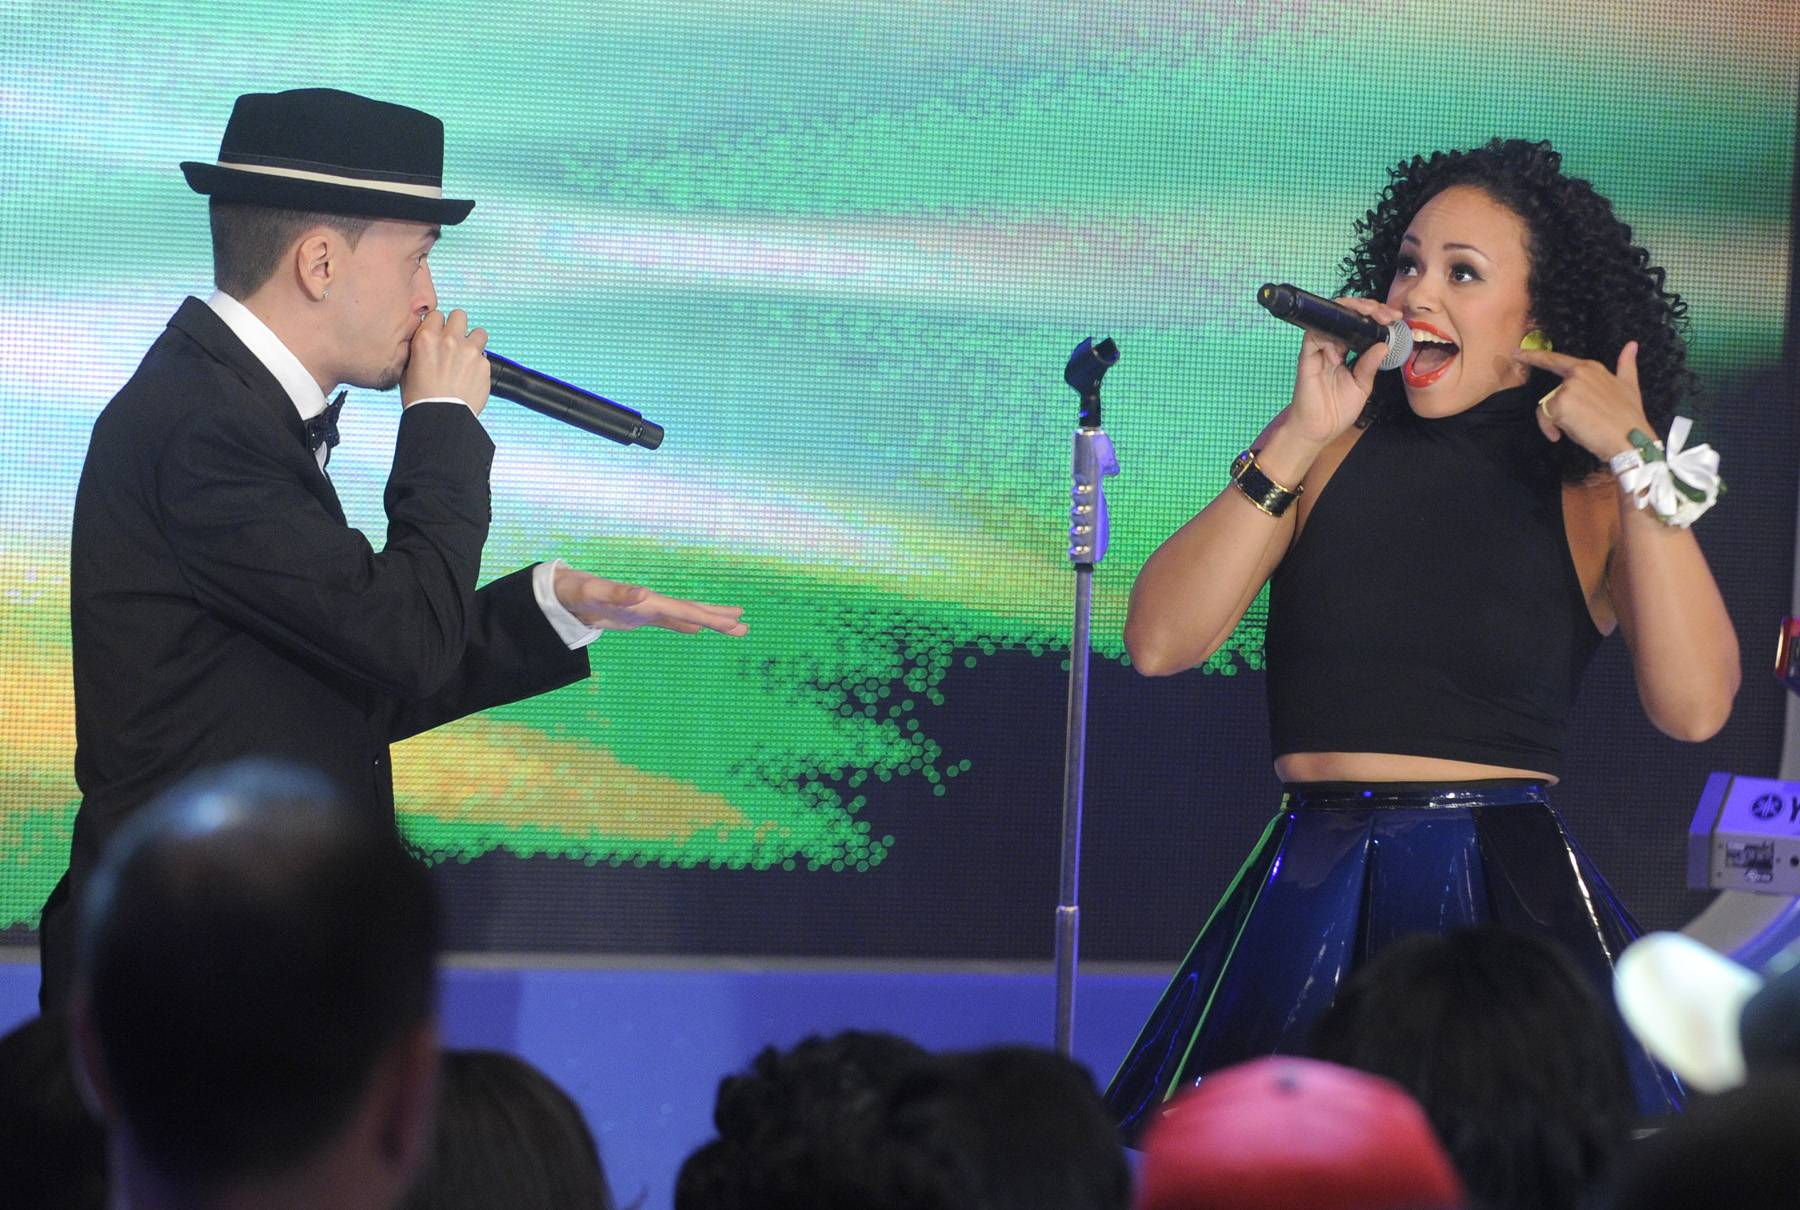 Sing To You - Elle Varner performs at 106 & Park, May 25, 2012. (Photo: John Ricard / BET)